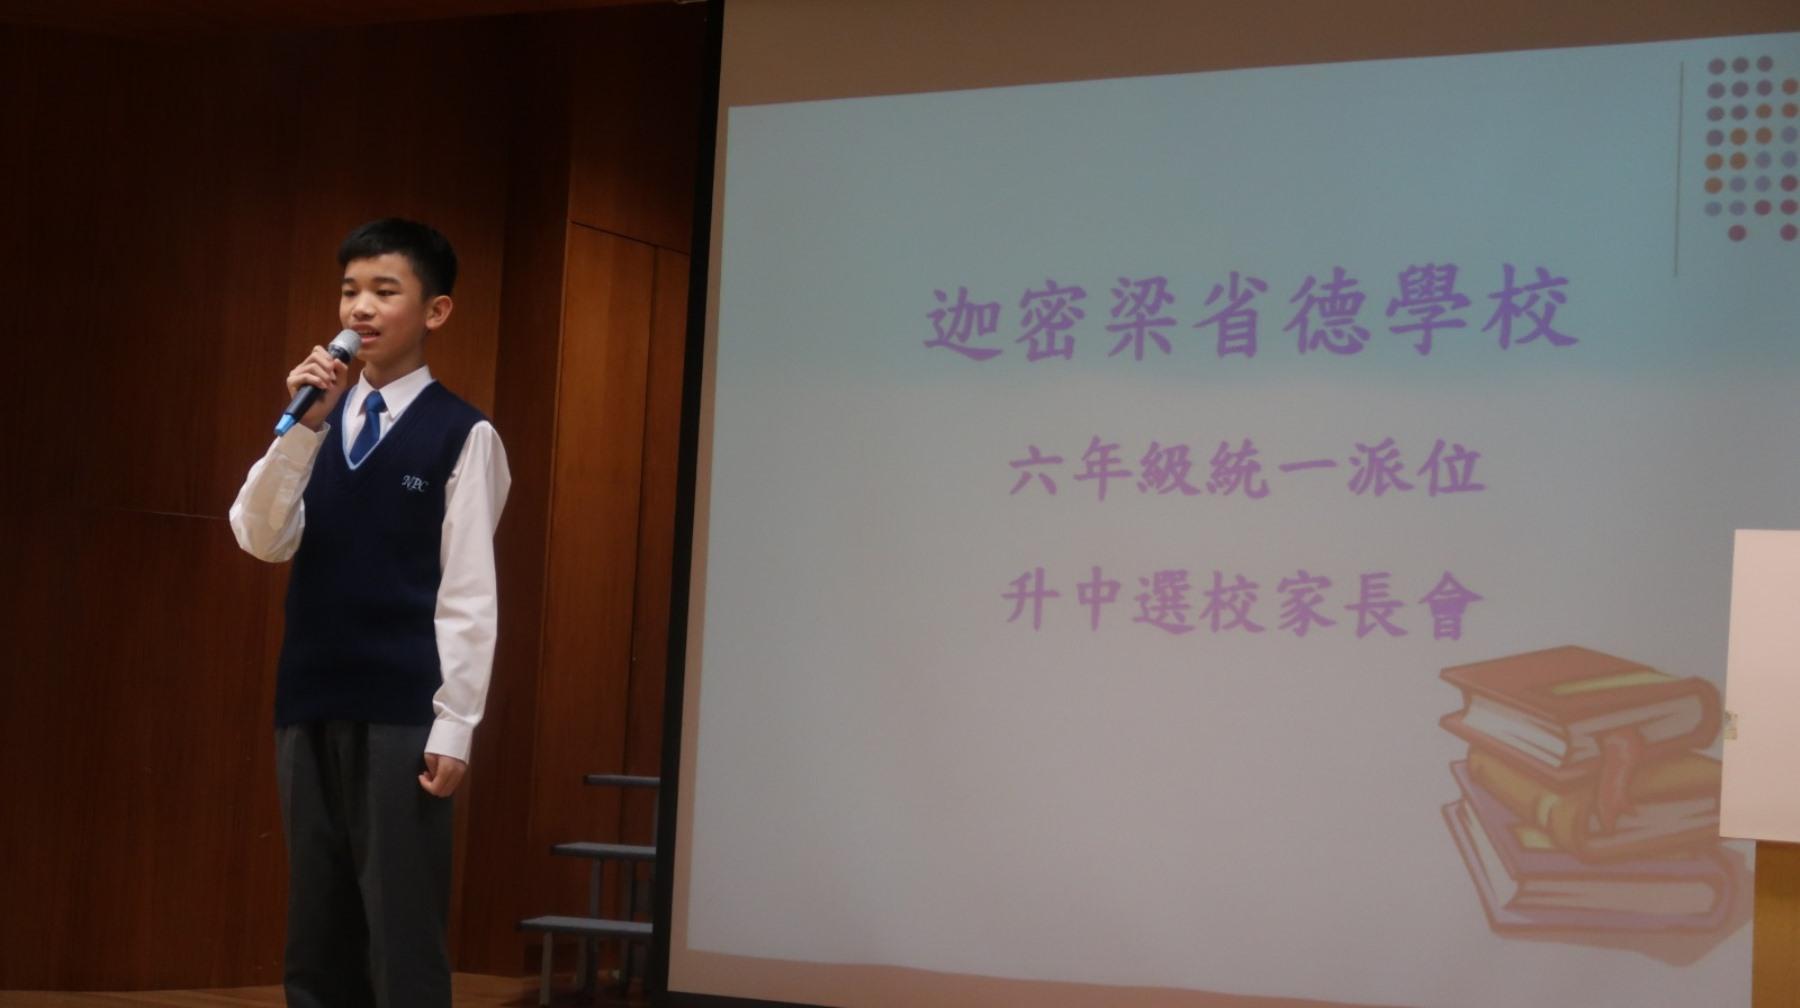 http://npc.edu.hk/sites/default/files/1_1451.jpg